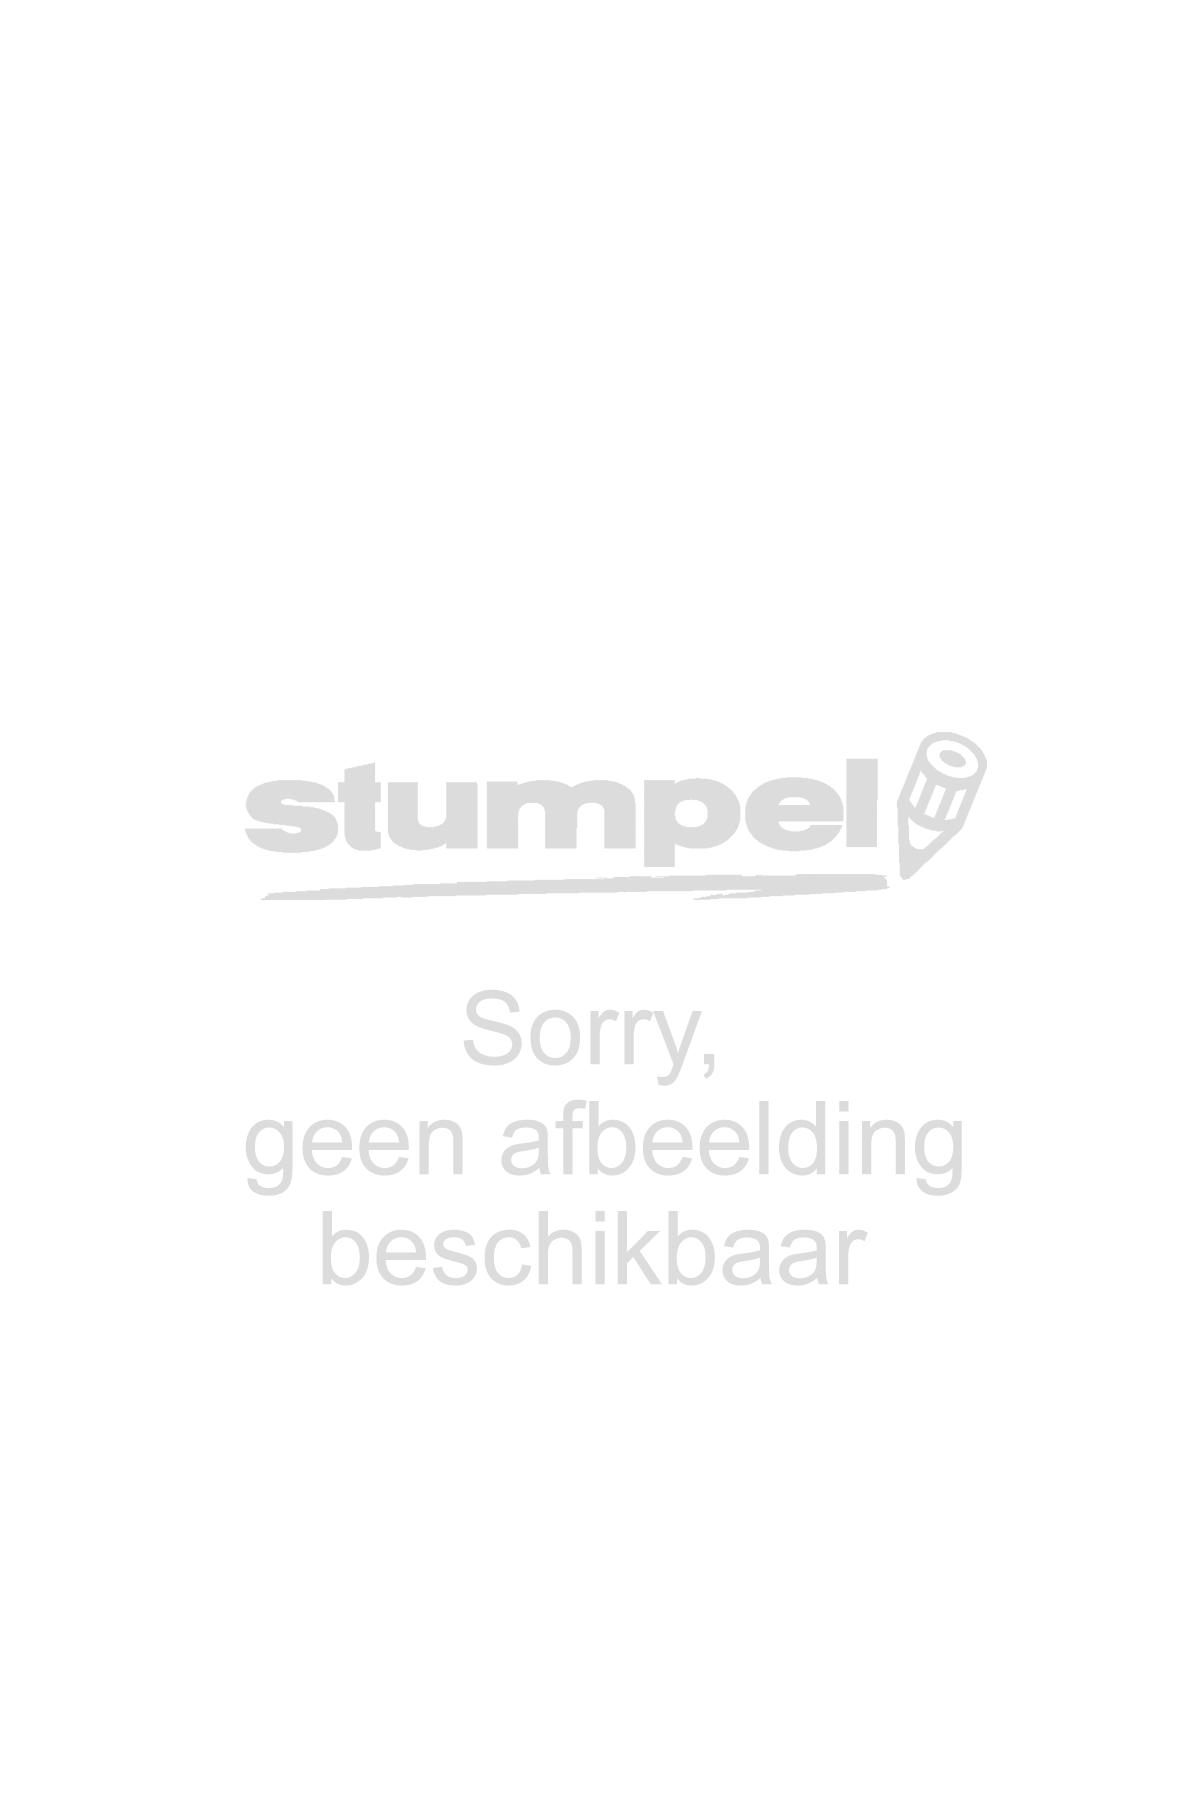 balpenvulling-schneider-office-765-m-zwart-625121